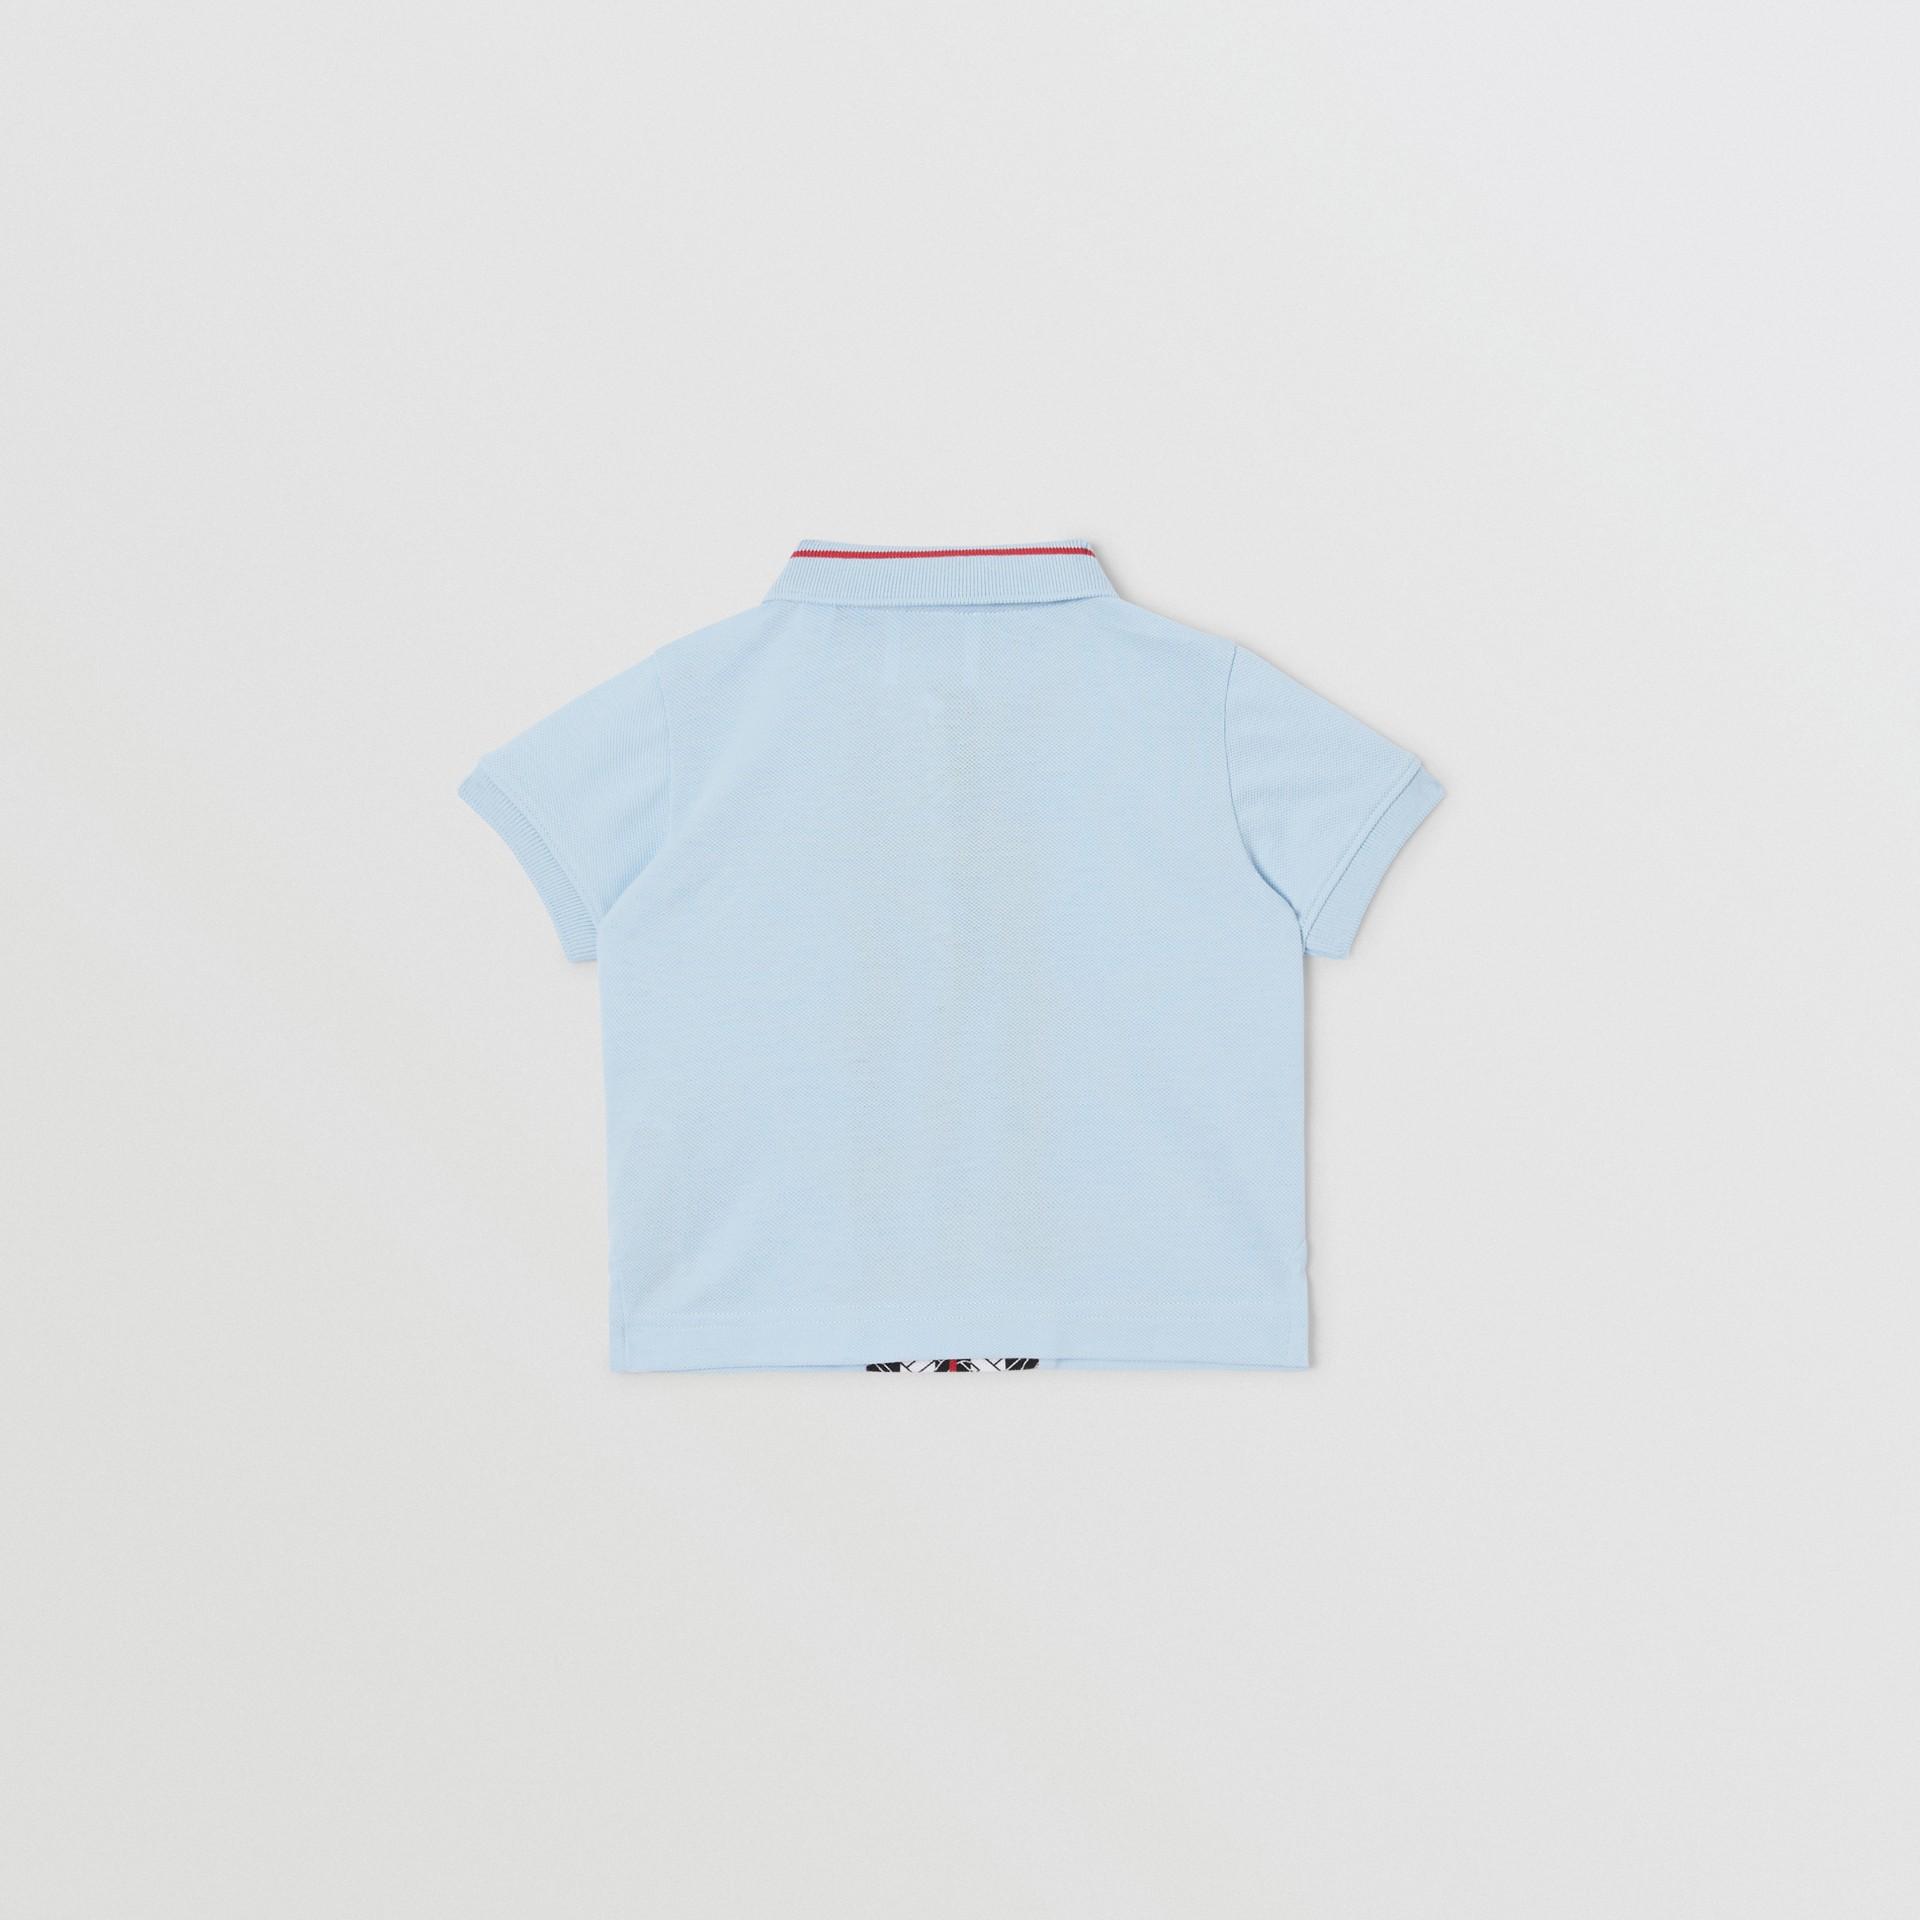 Monogram Stripe Print Cotton Piqué Polo Shirt in Pale Blue - Children | Burberry Hong Kong S.A.R - gallery image 3